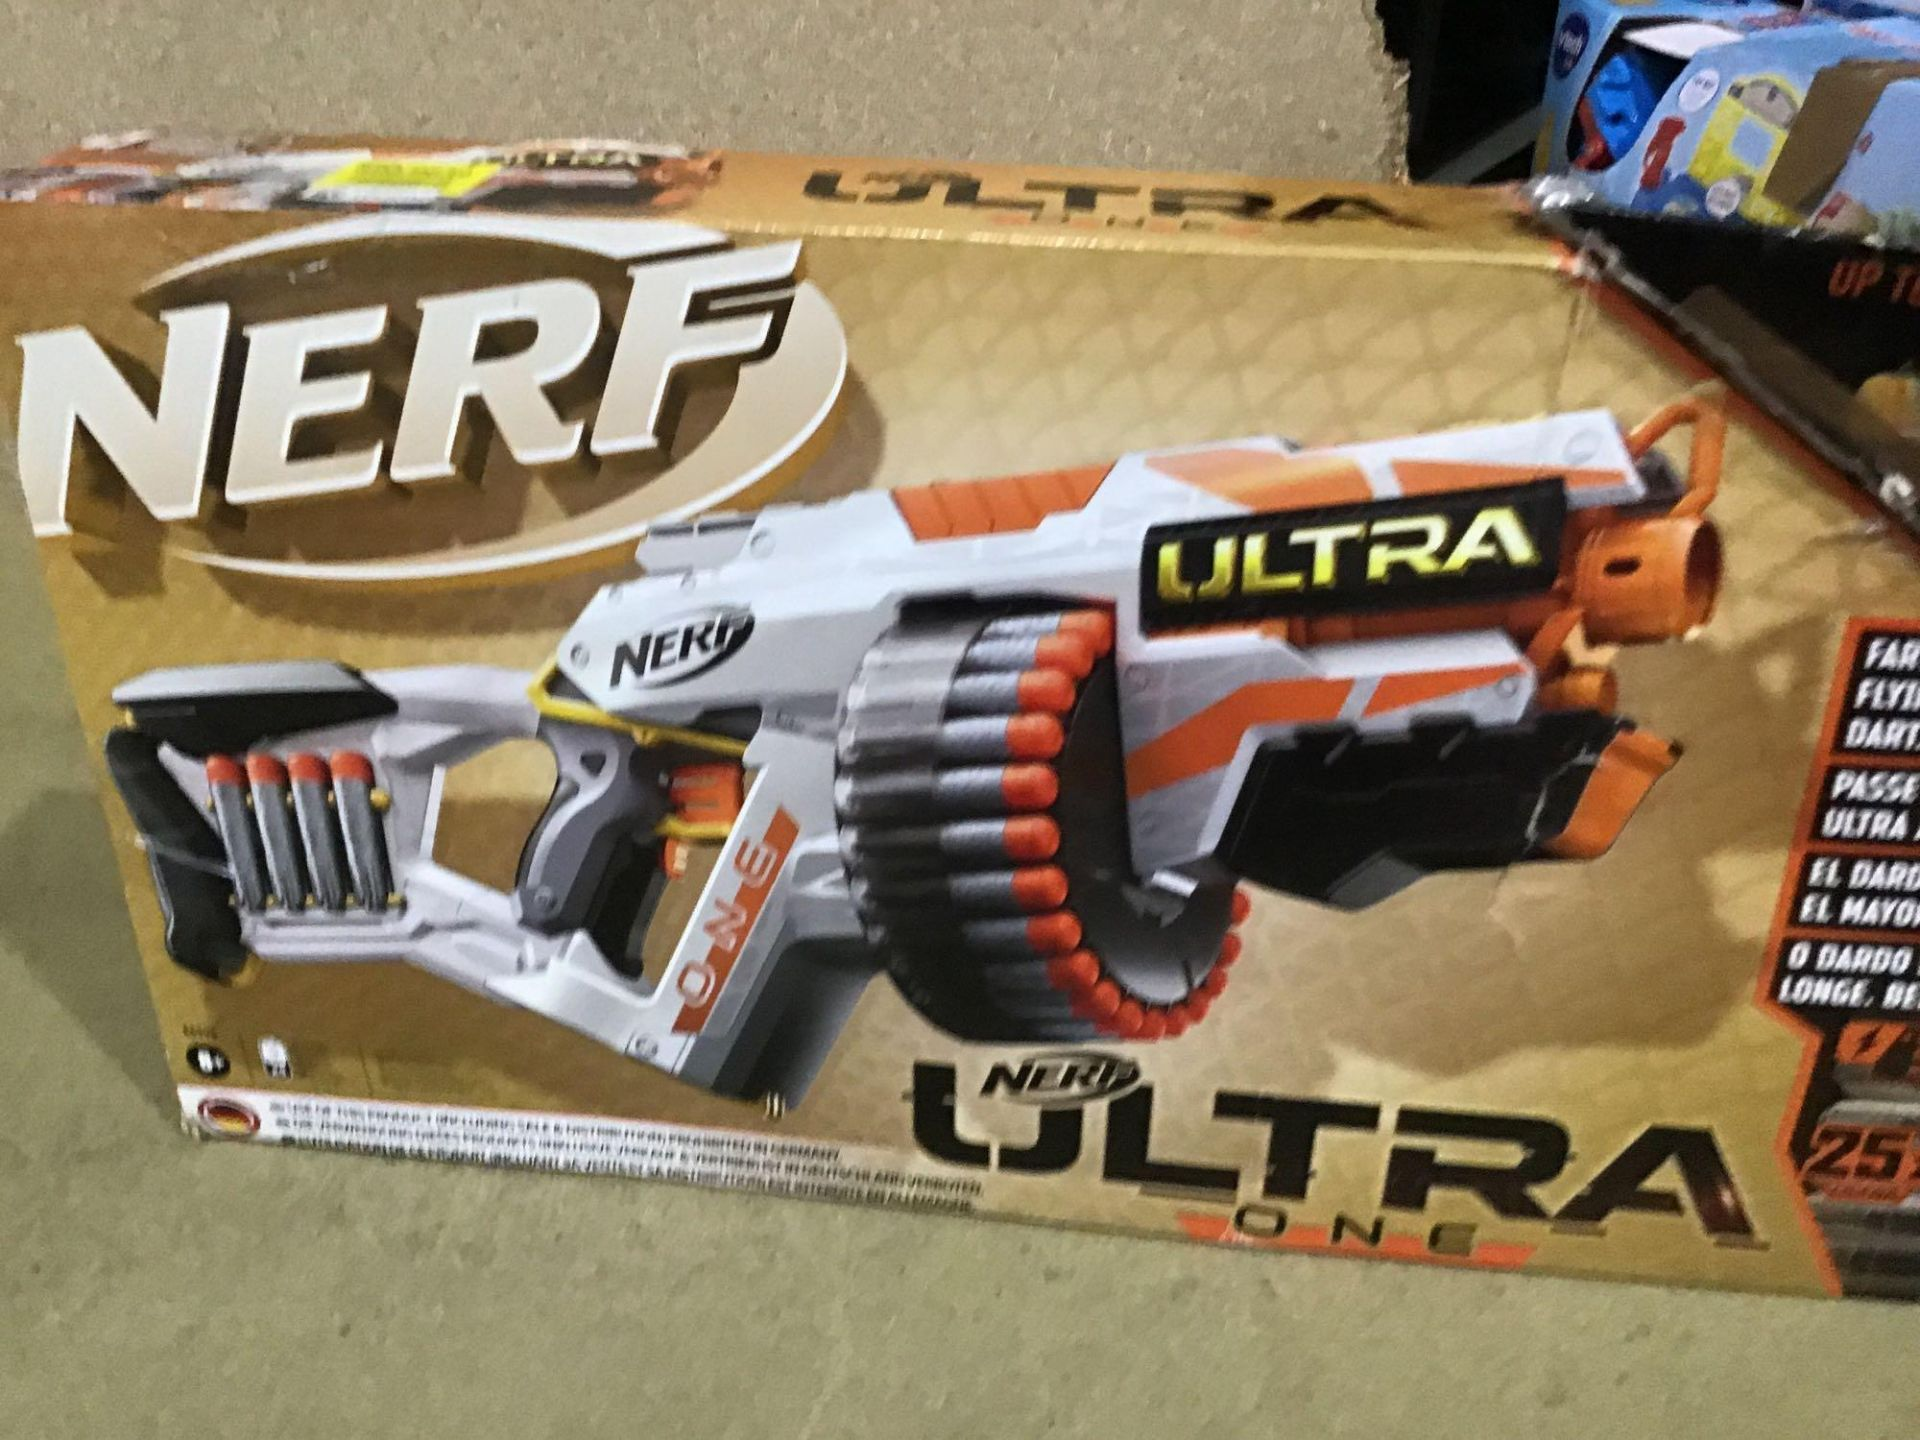 Nerf Ultra One Motorised Blaster, £50.00 RRP - Image 2 of 4